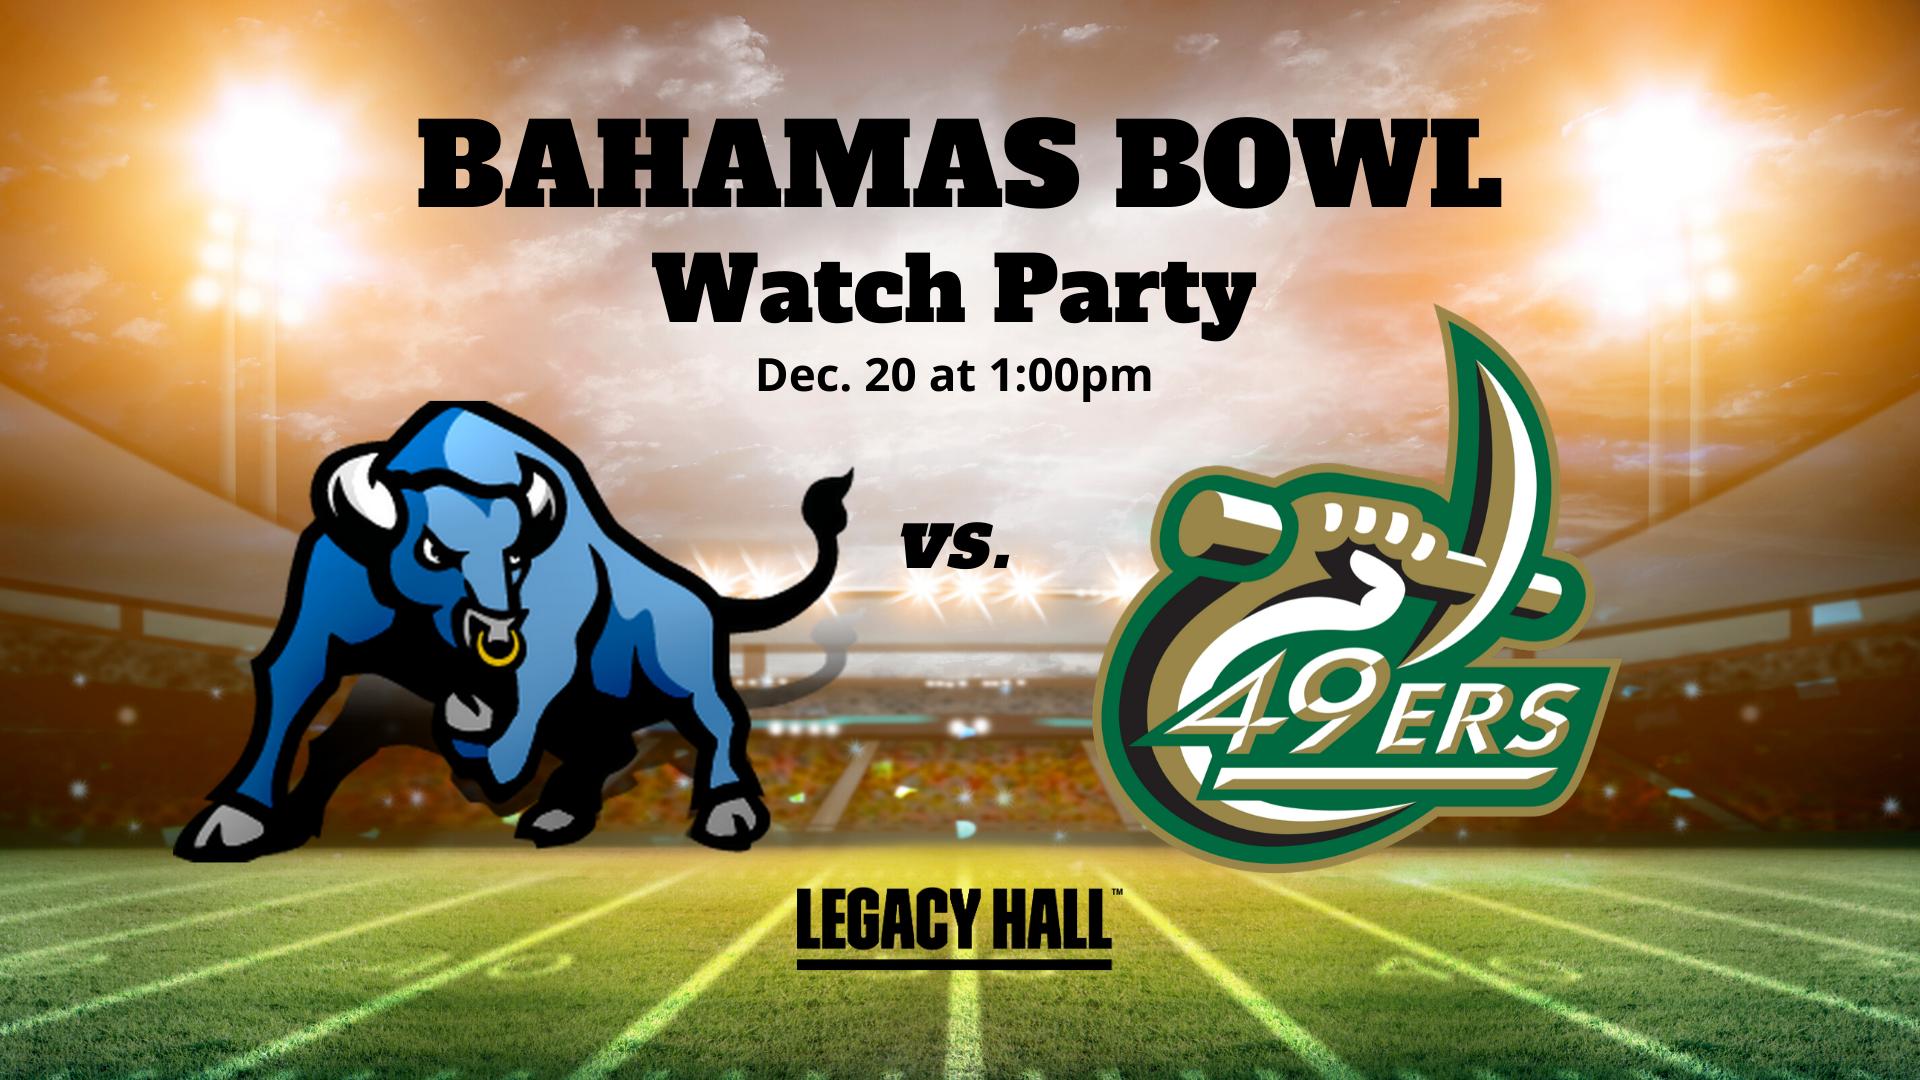 Bahamas Bowl Watch Party - hero